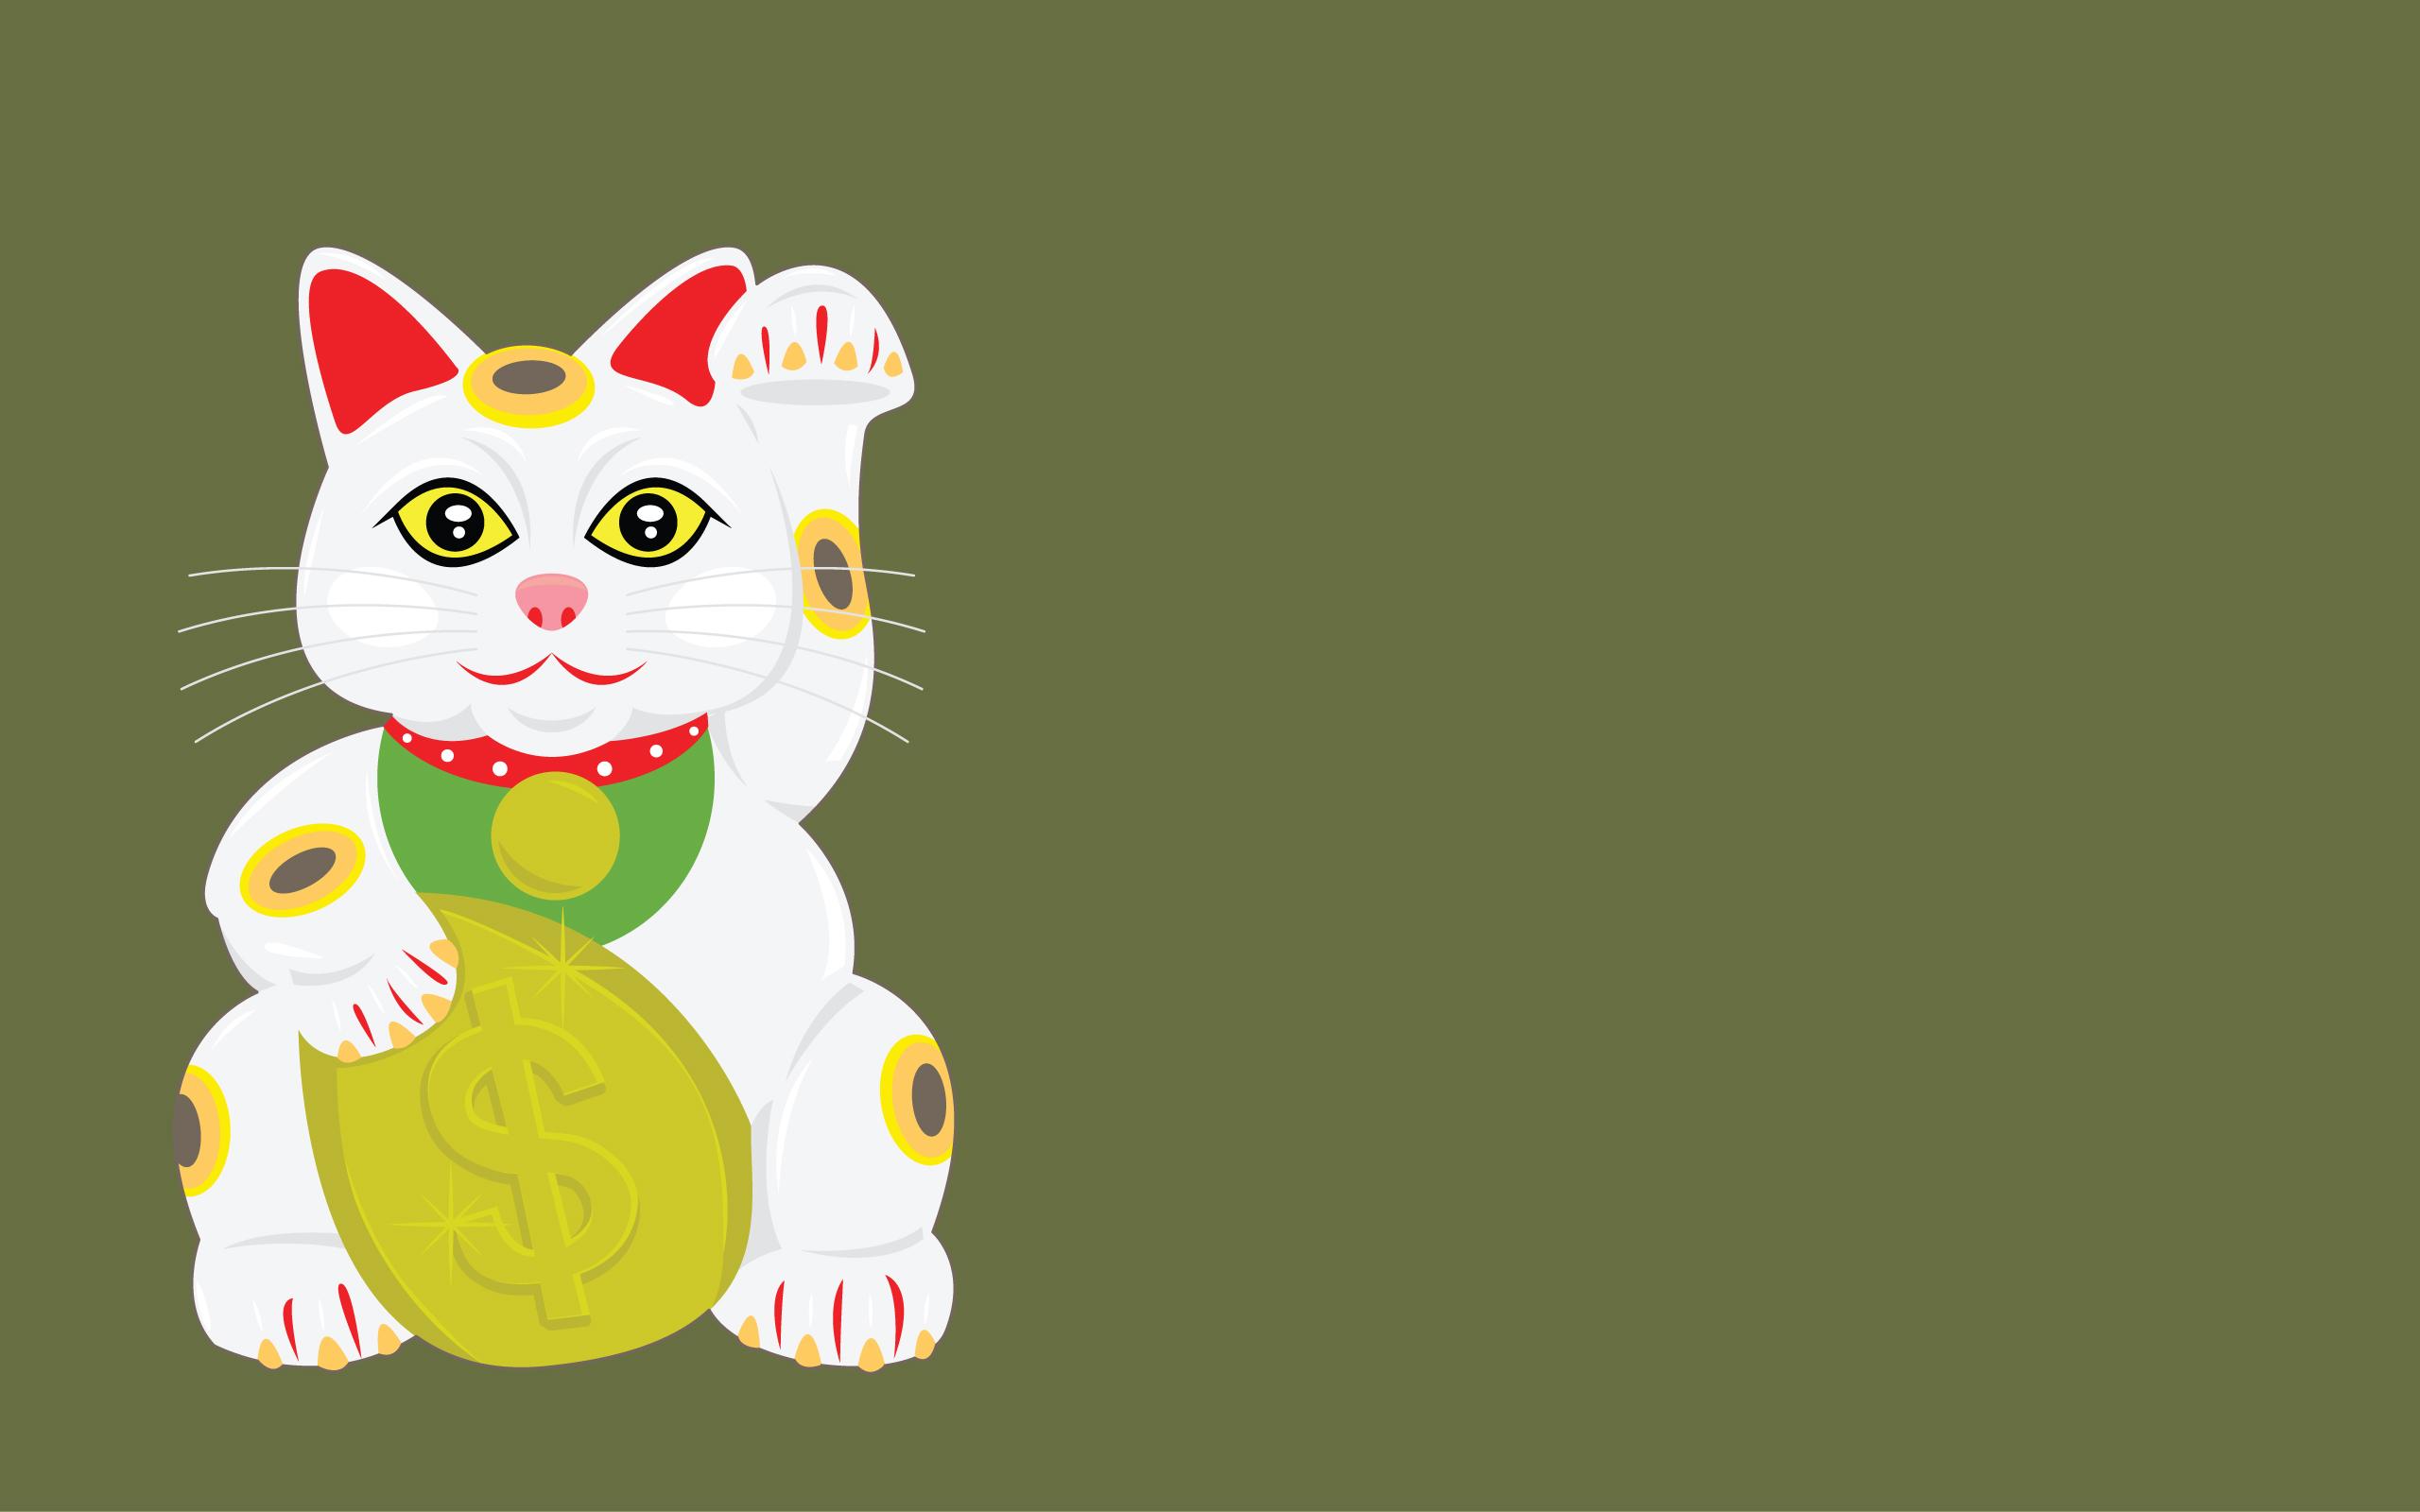 free vector lucky cat vector wallpaper 011184 lucky cat widejpg 2560x1600